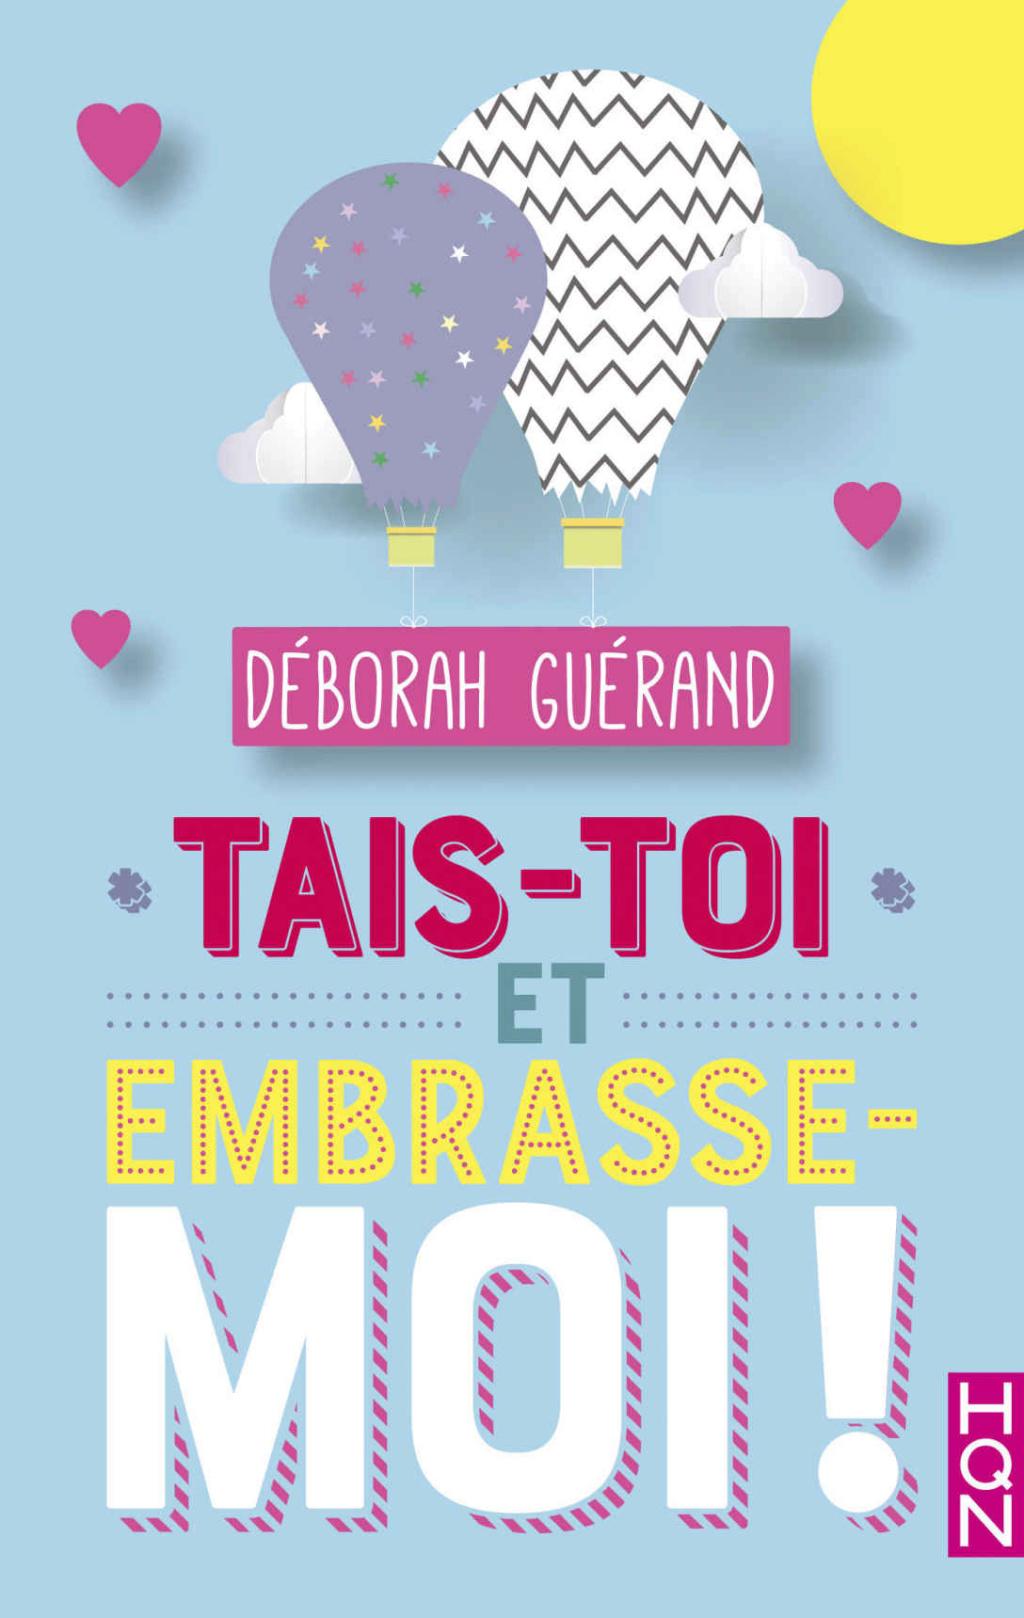 GUERAND Déborah - Tais-toi et Embrasse-moi! 13854210